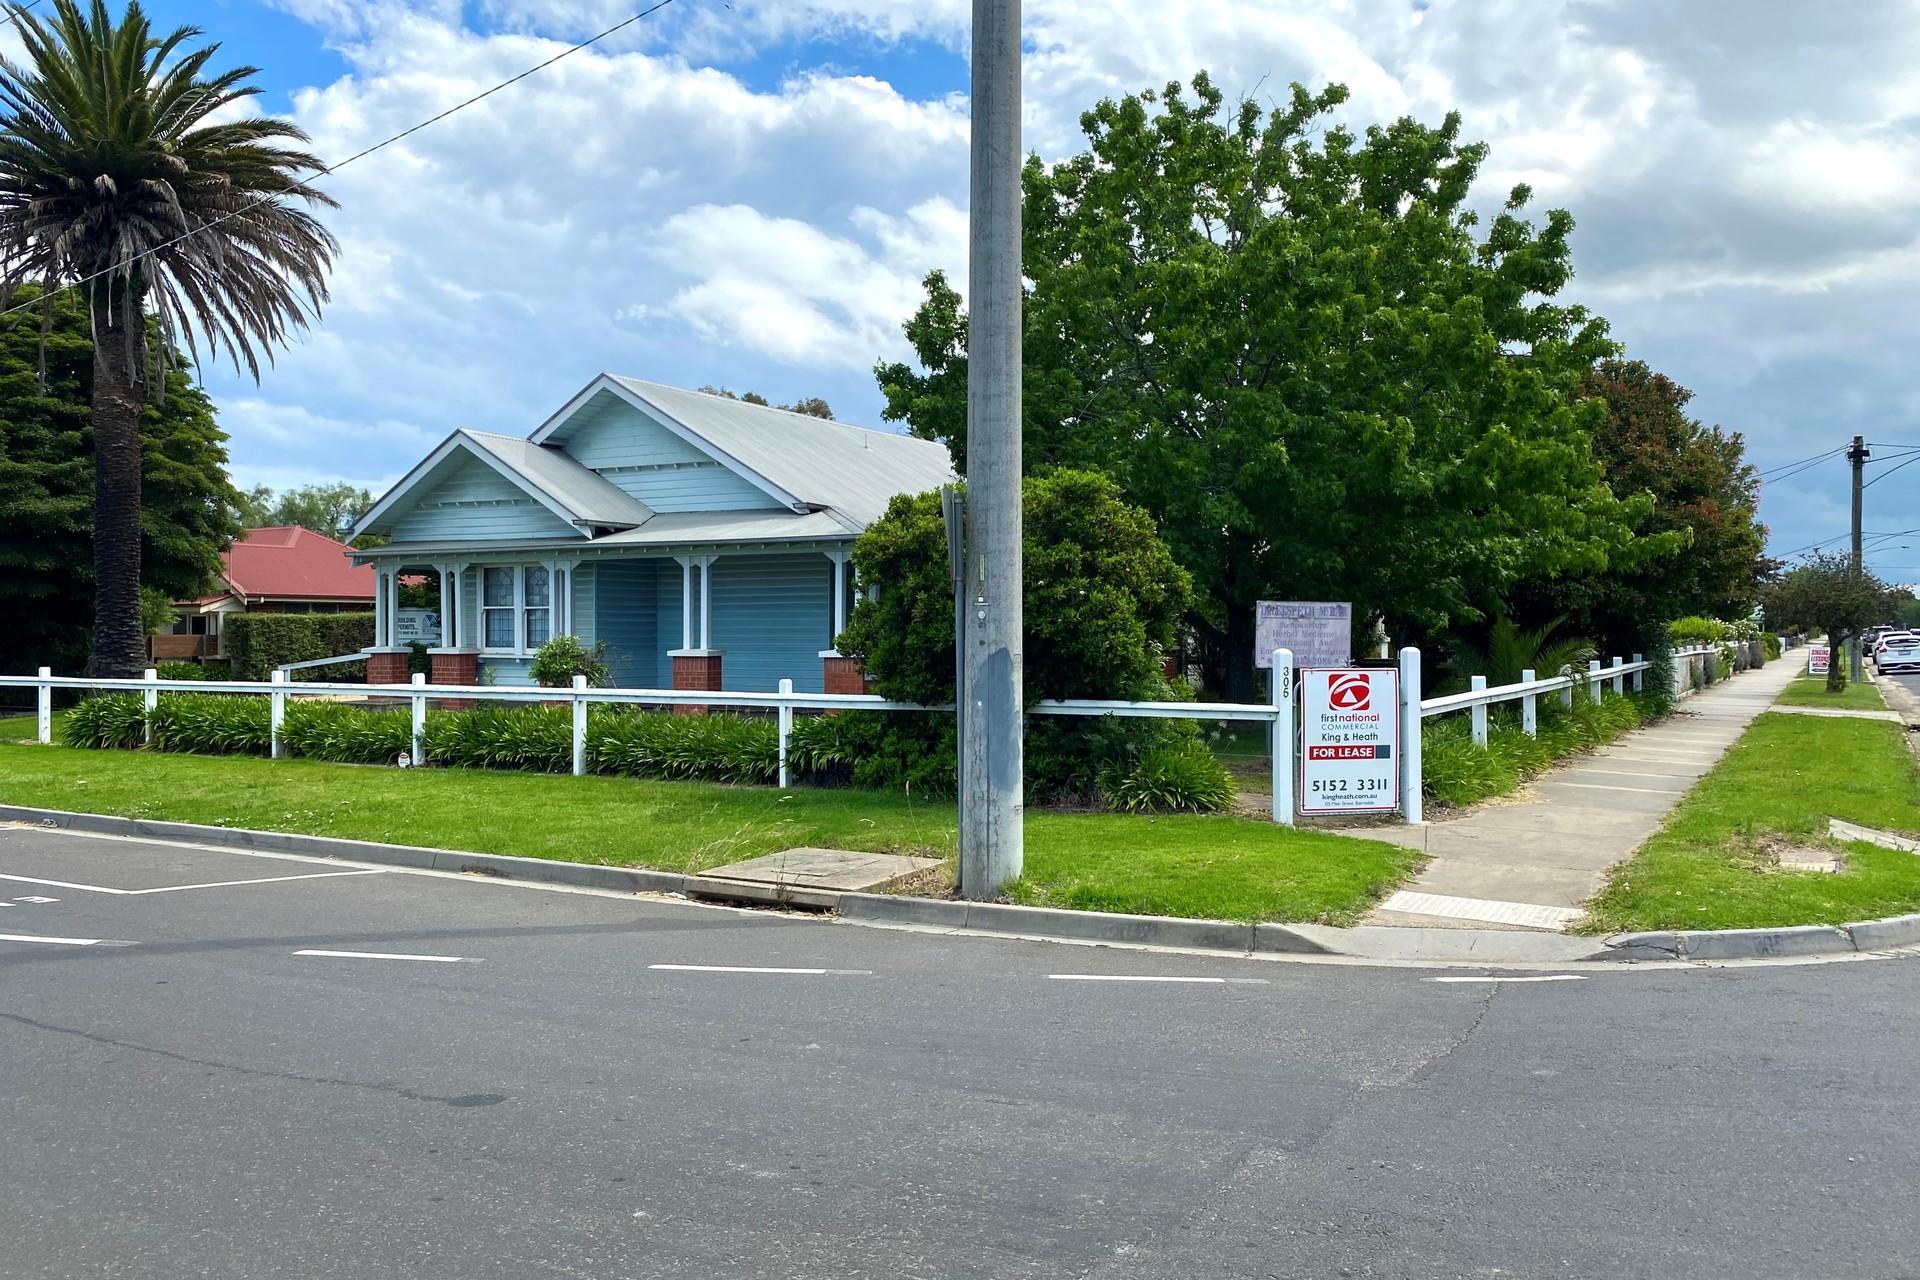 305 Main Street, Bairnsdale VIC 3875-1